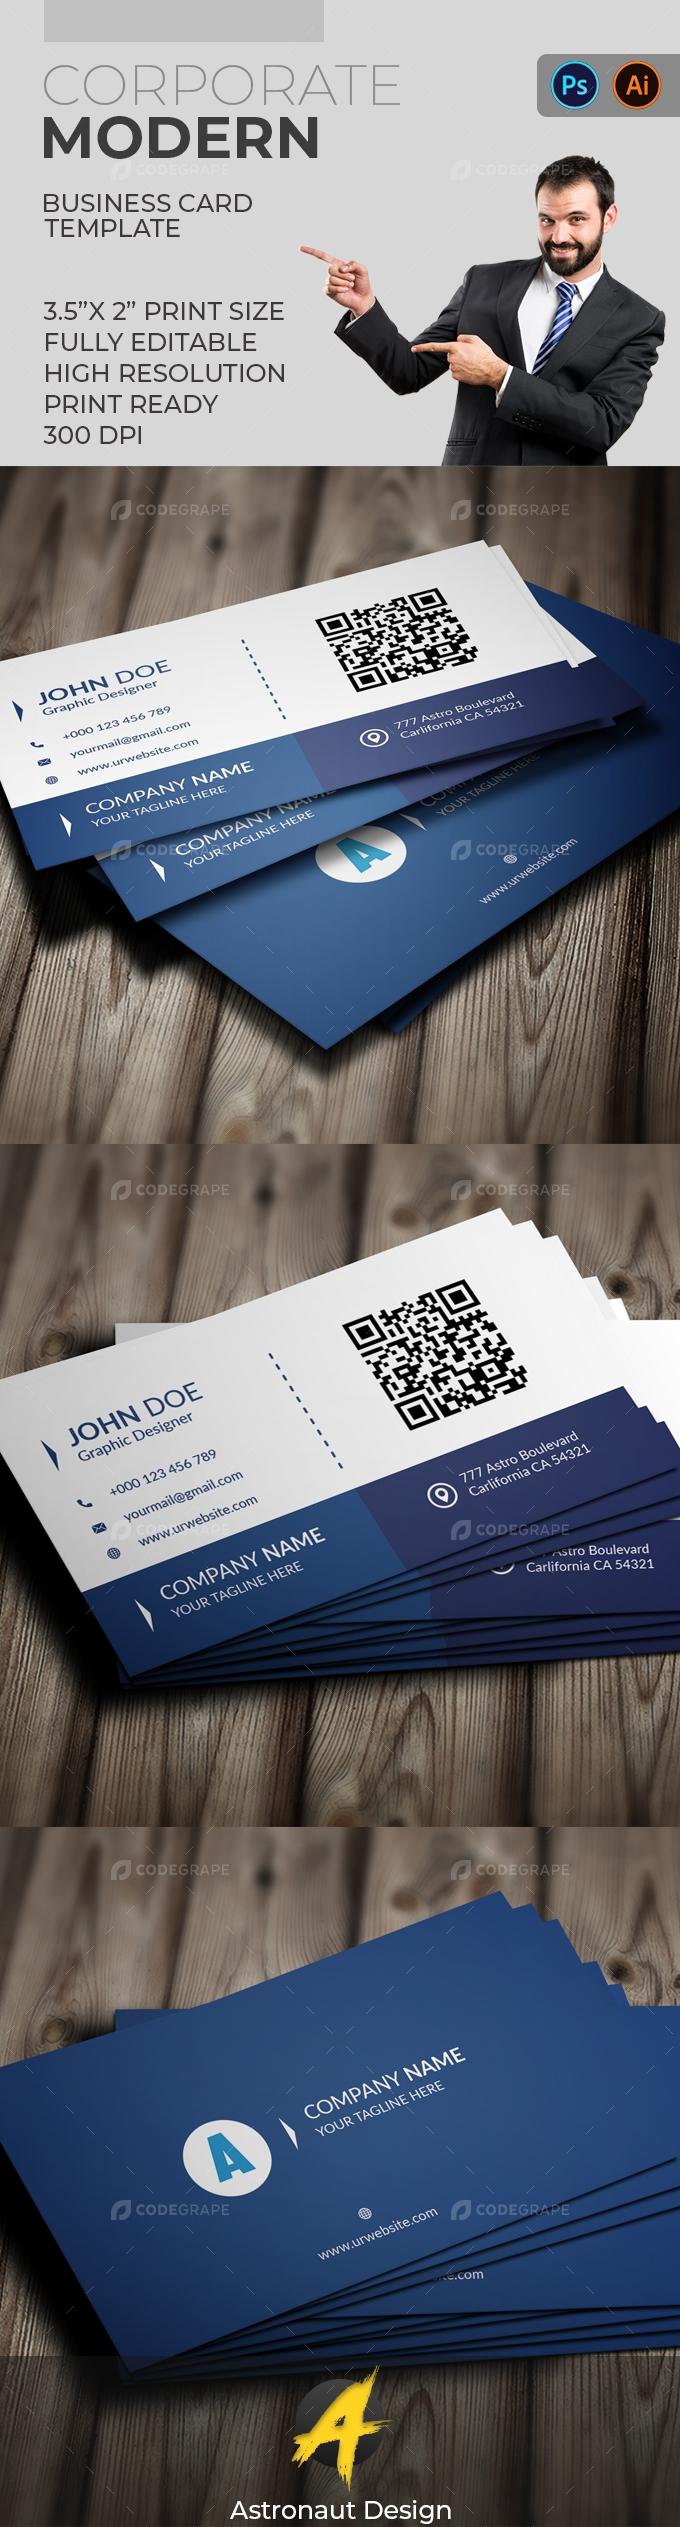 Corporate Business Card [VOL-15]